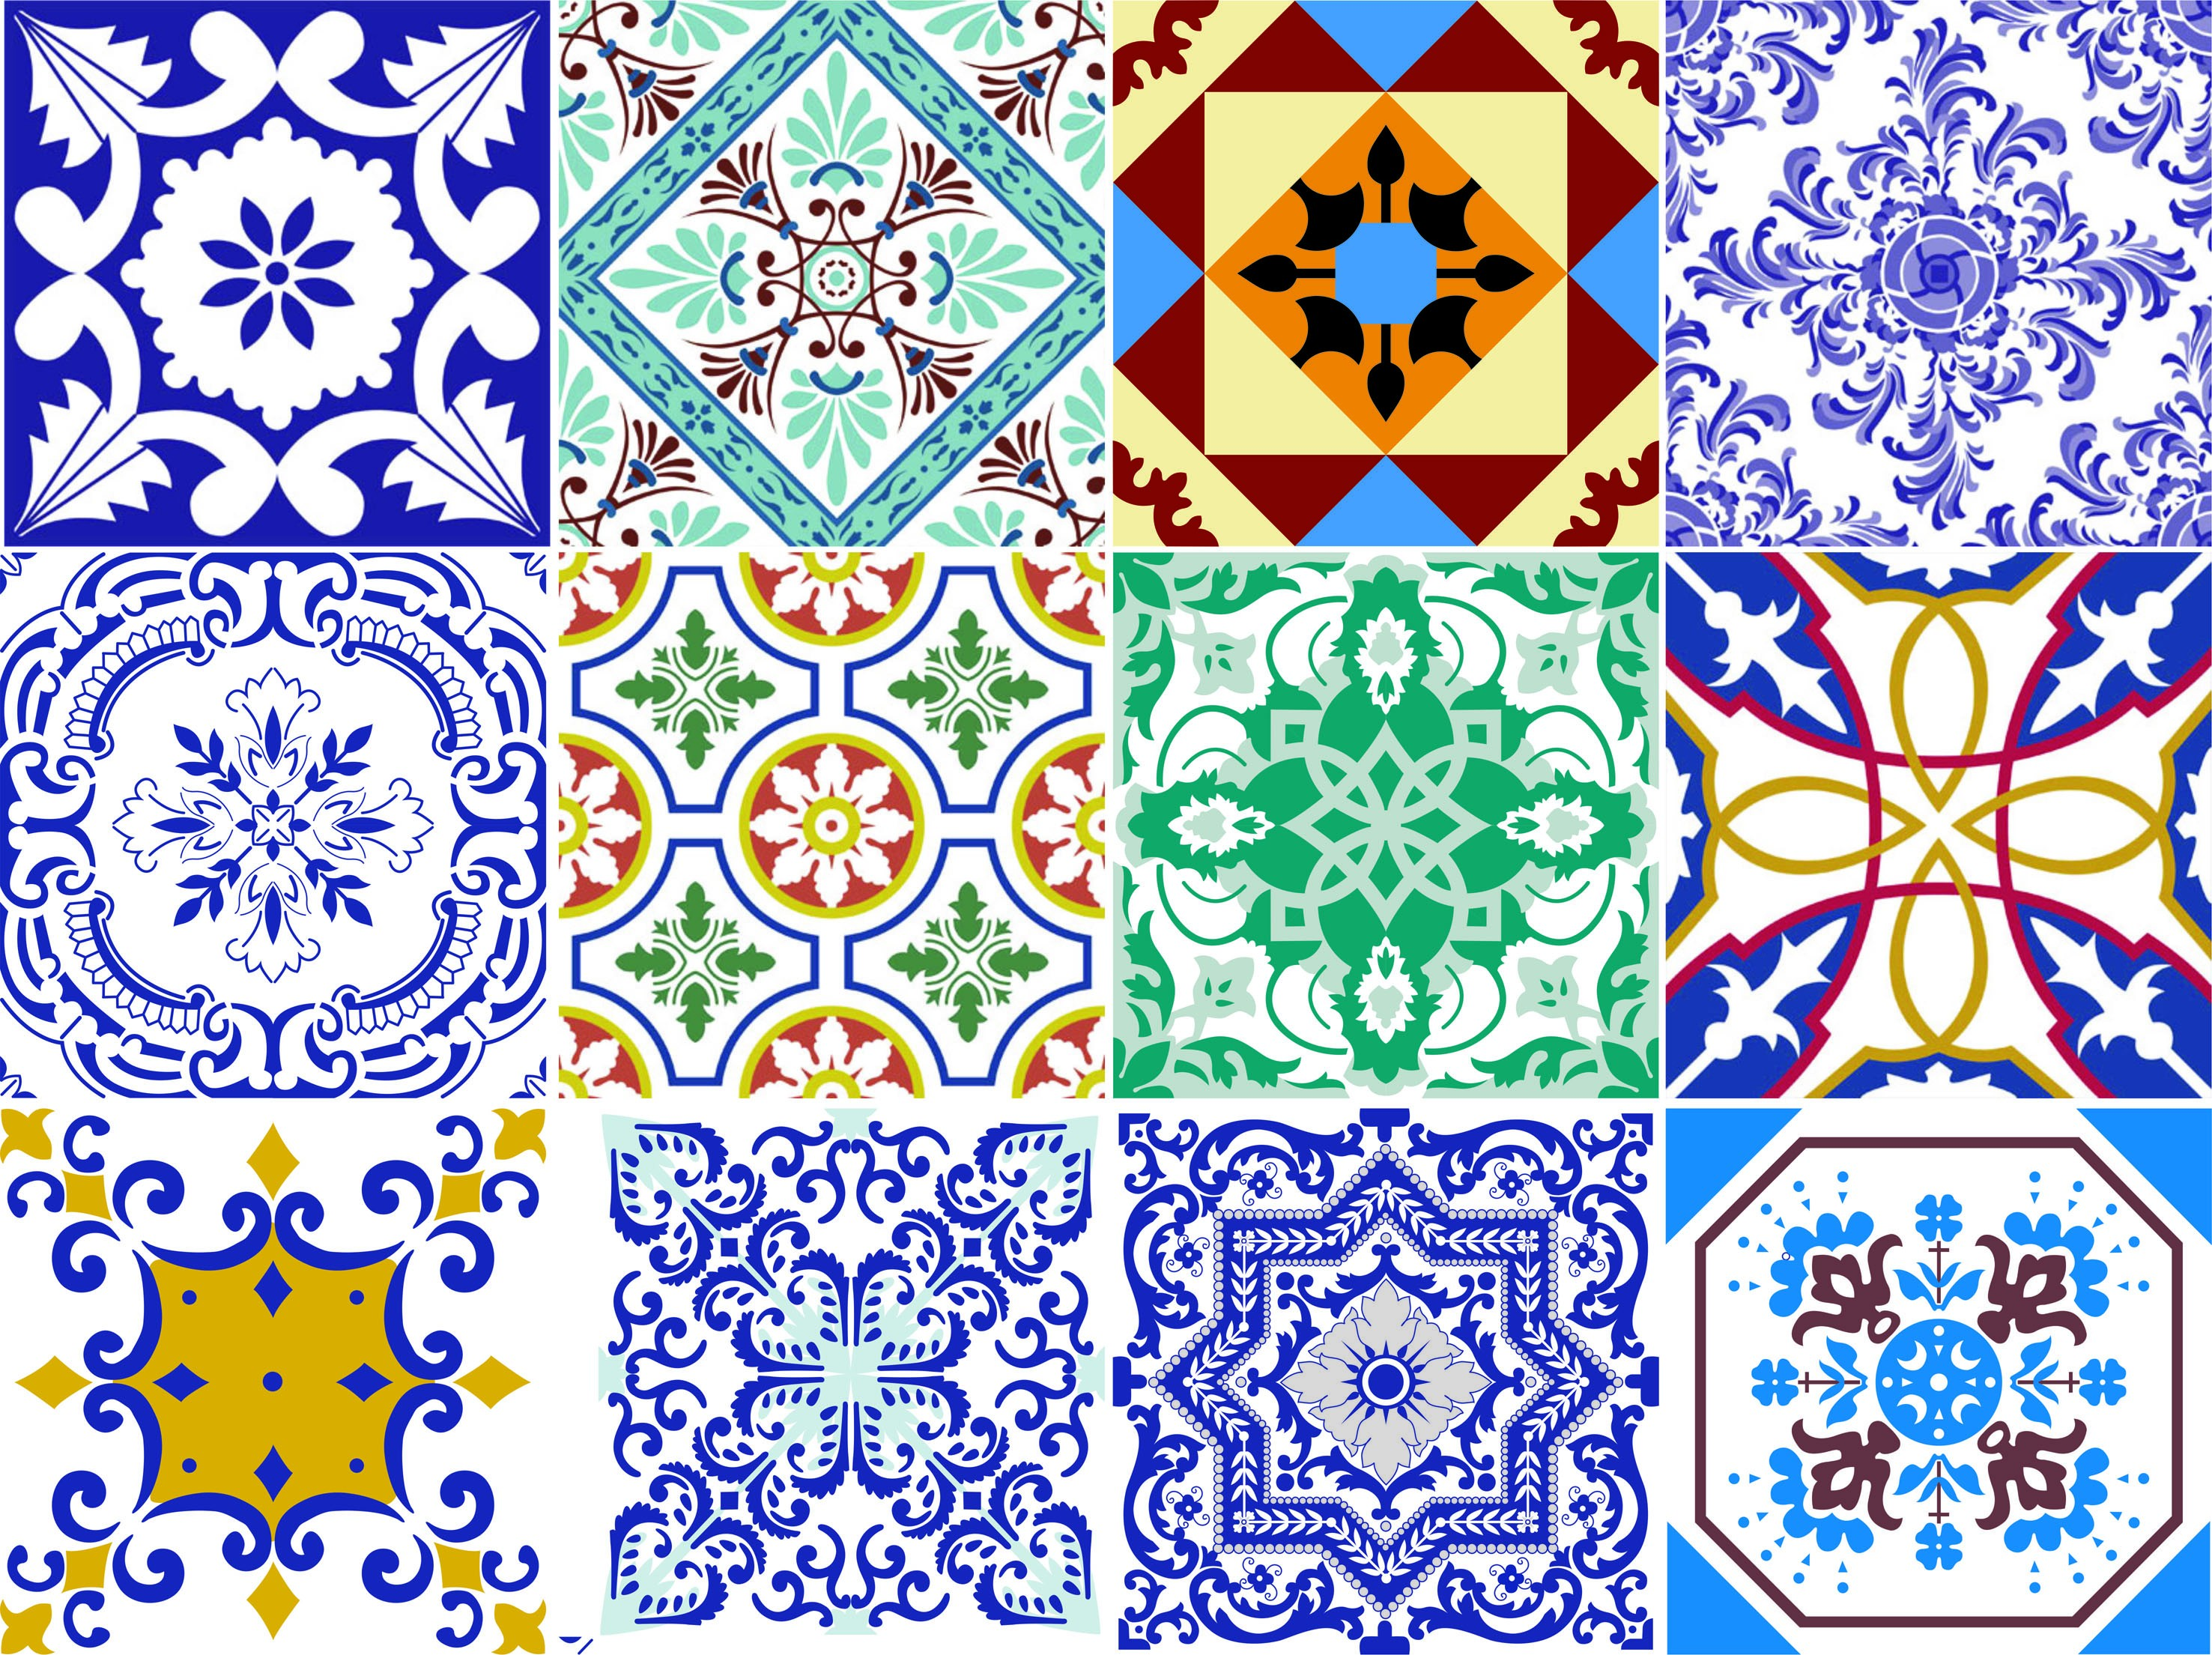 Adesivo vinilico azulejo portugues rca work comunica o for Revestimientos vinilicos para azulejos